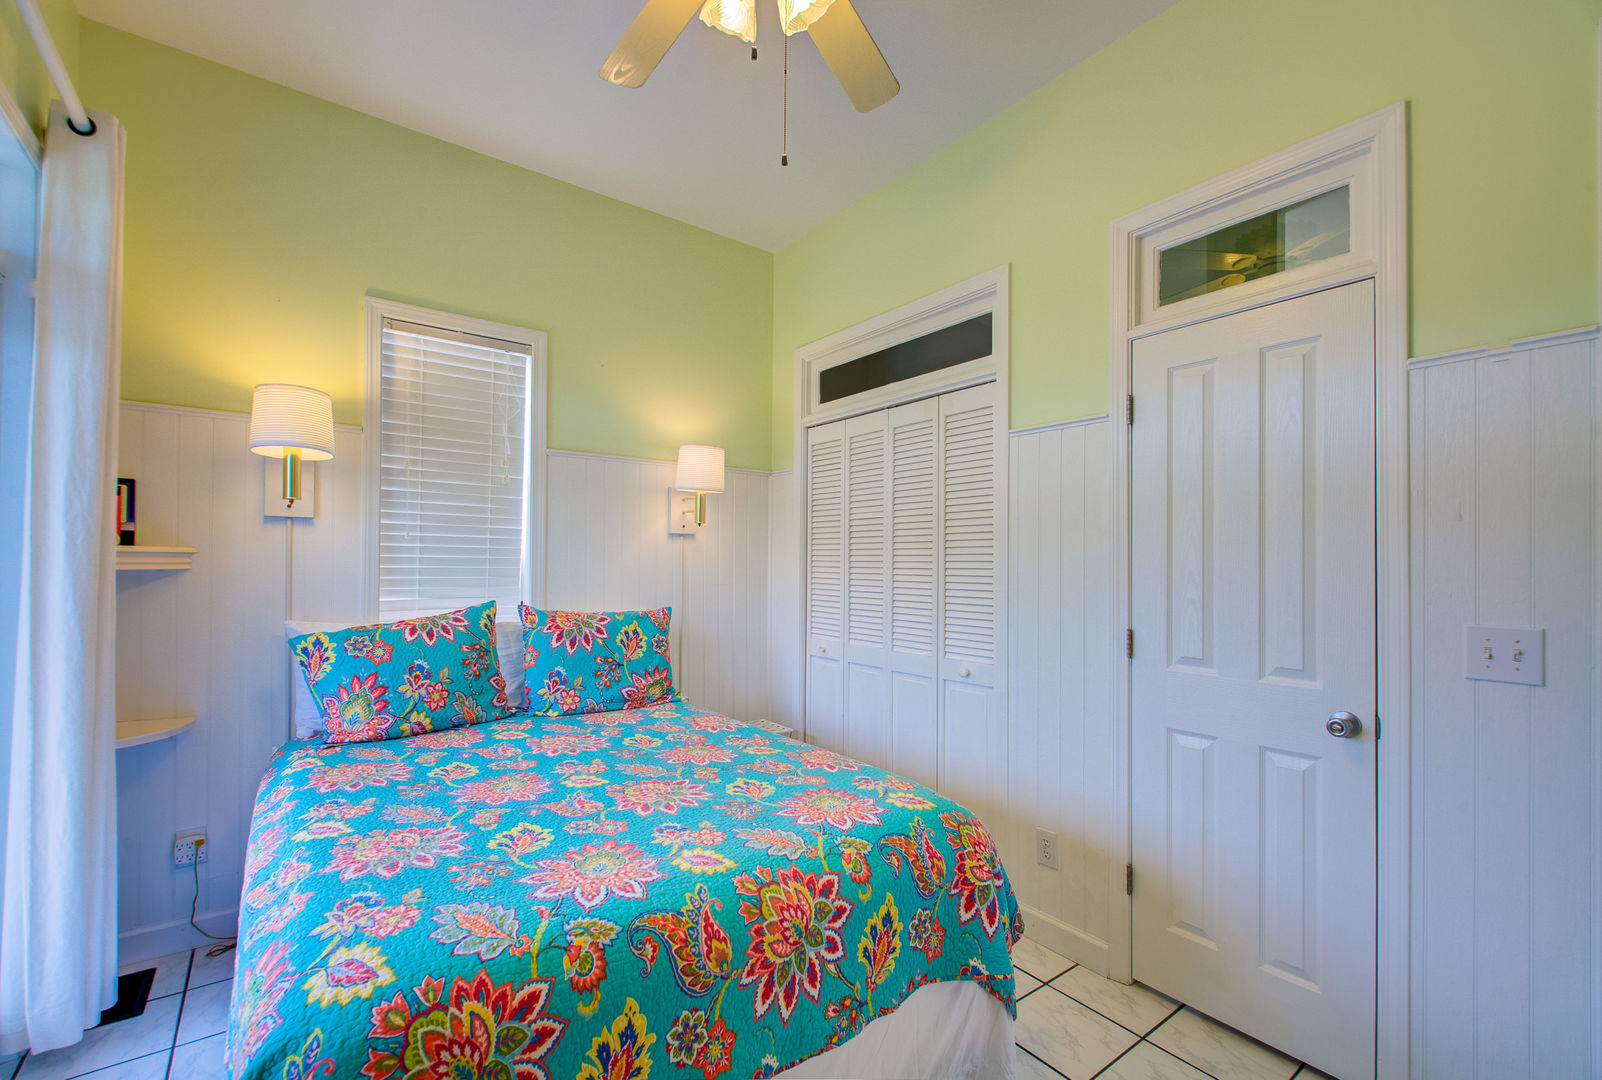 Bedroom Offers Plenty of Closet Space.